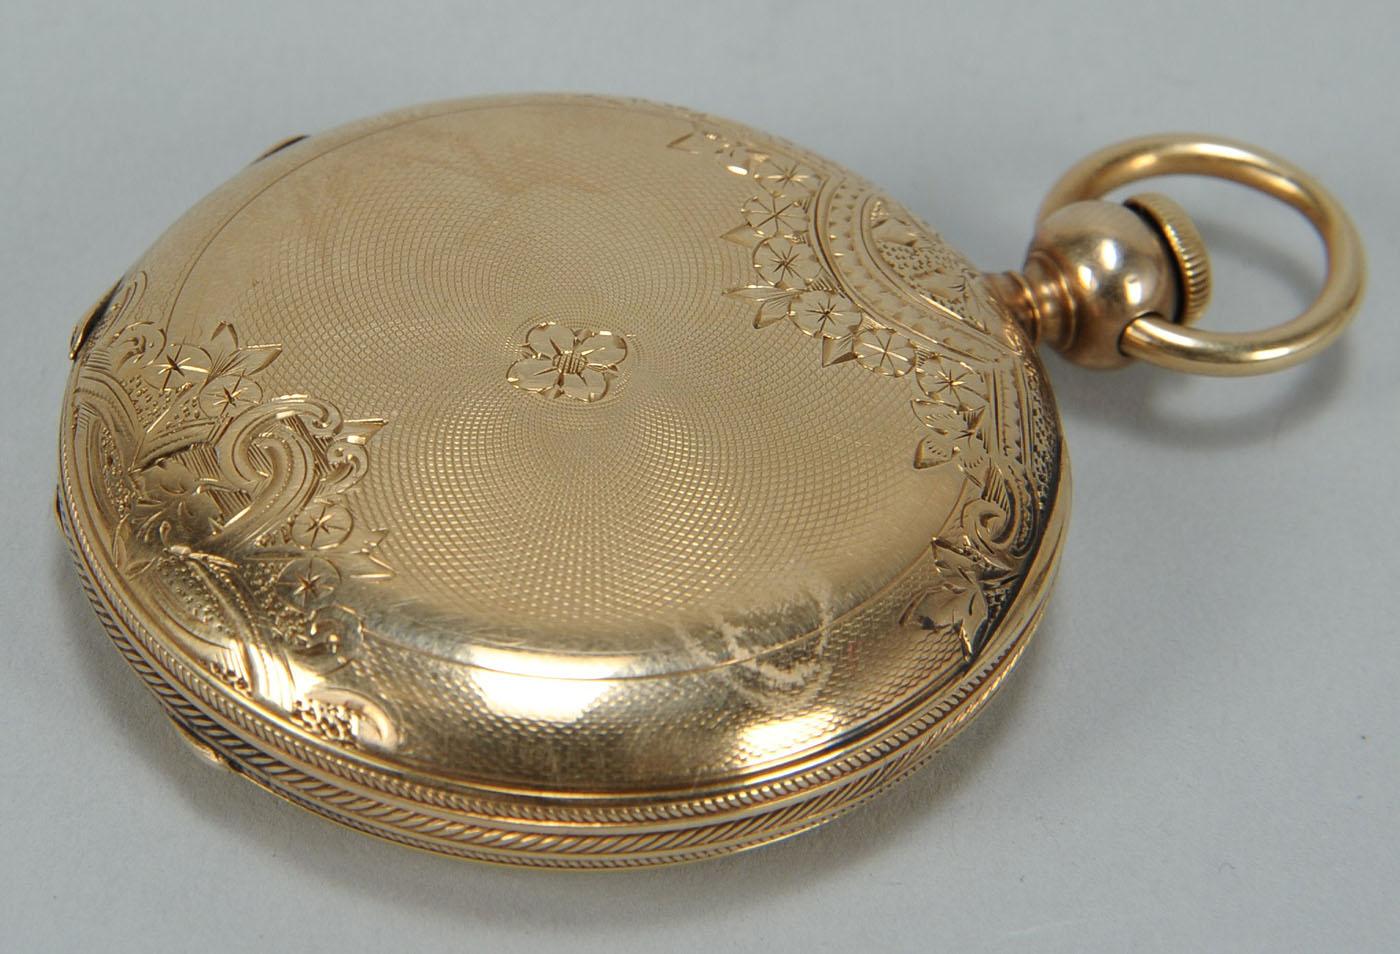 Lot 171 14k Gold Elgin Pocket Watch Bird Decorated Face